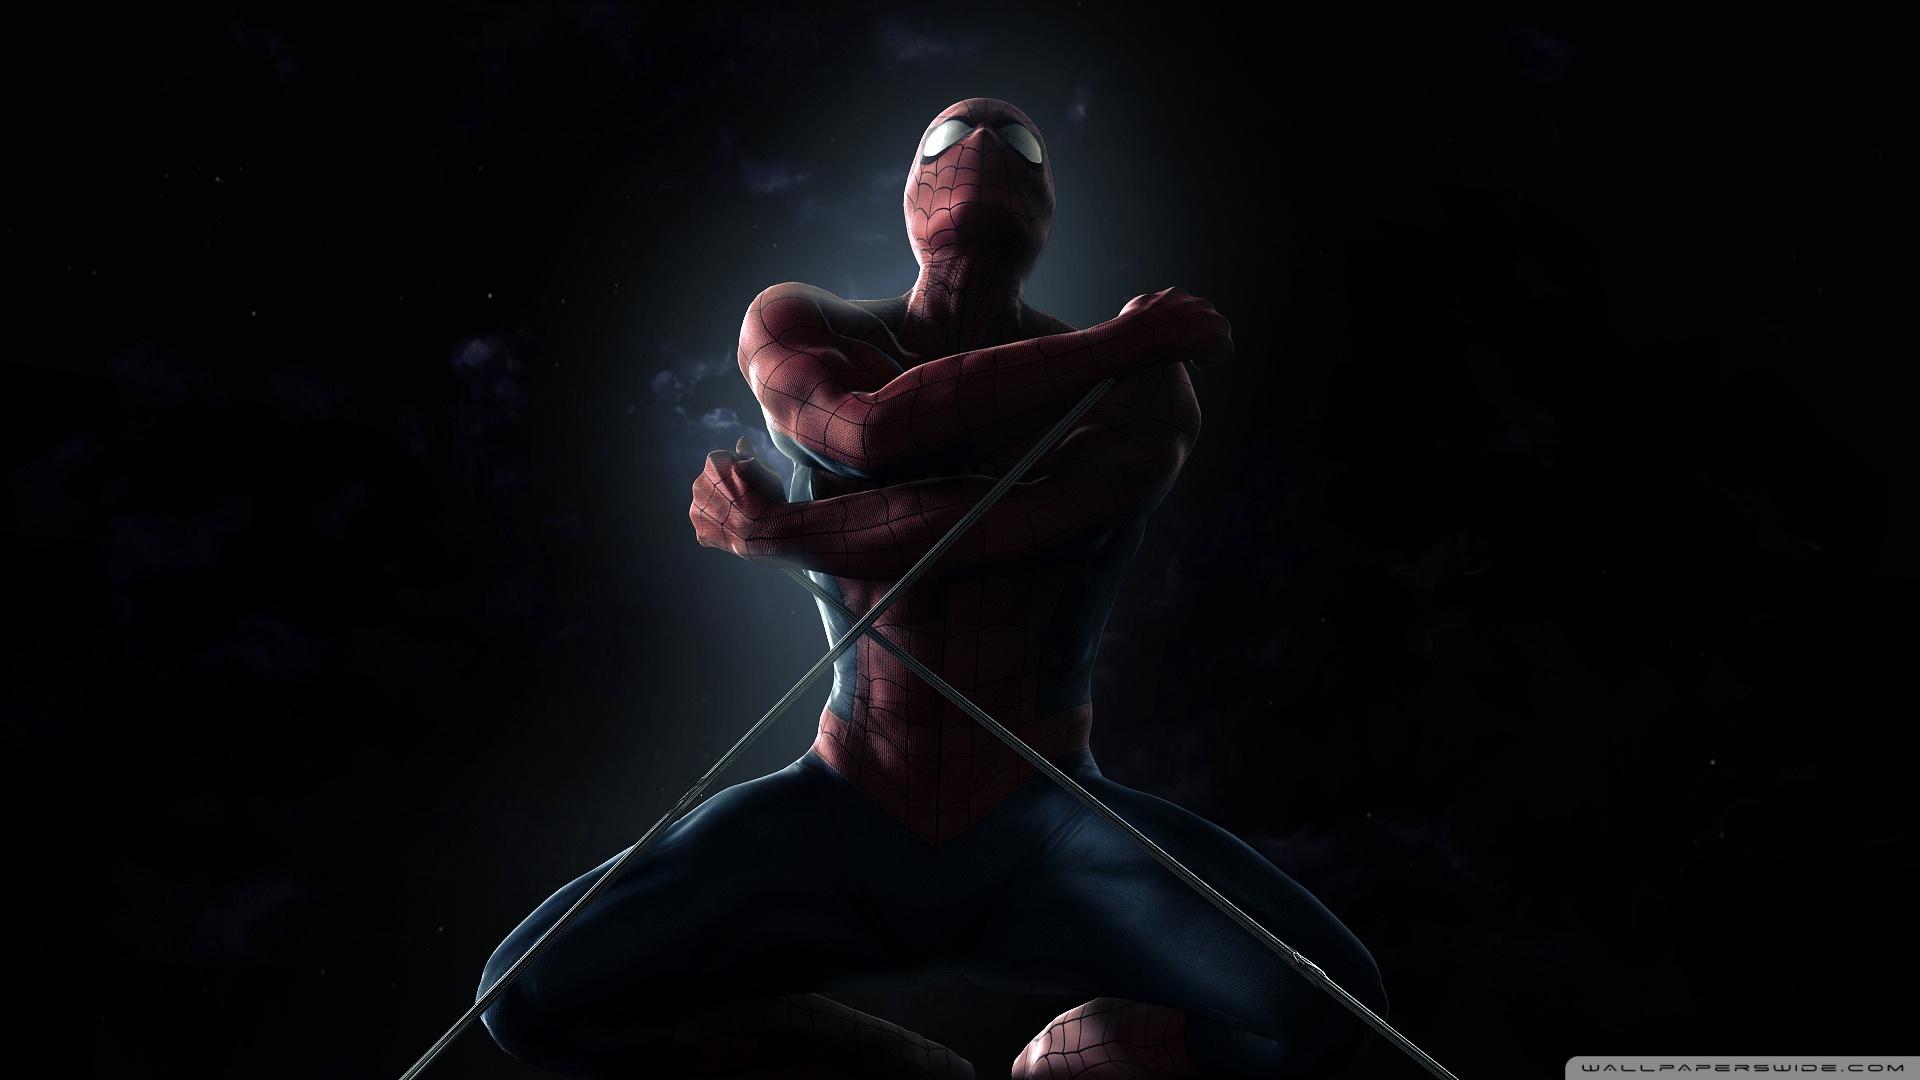 the_amazing_spider_man_2012_film-wallpaper-1920x1080.jpg